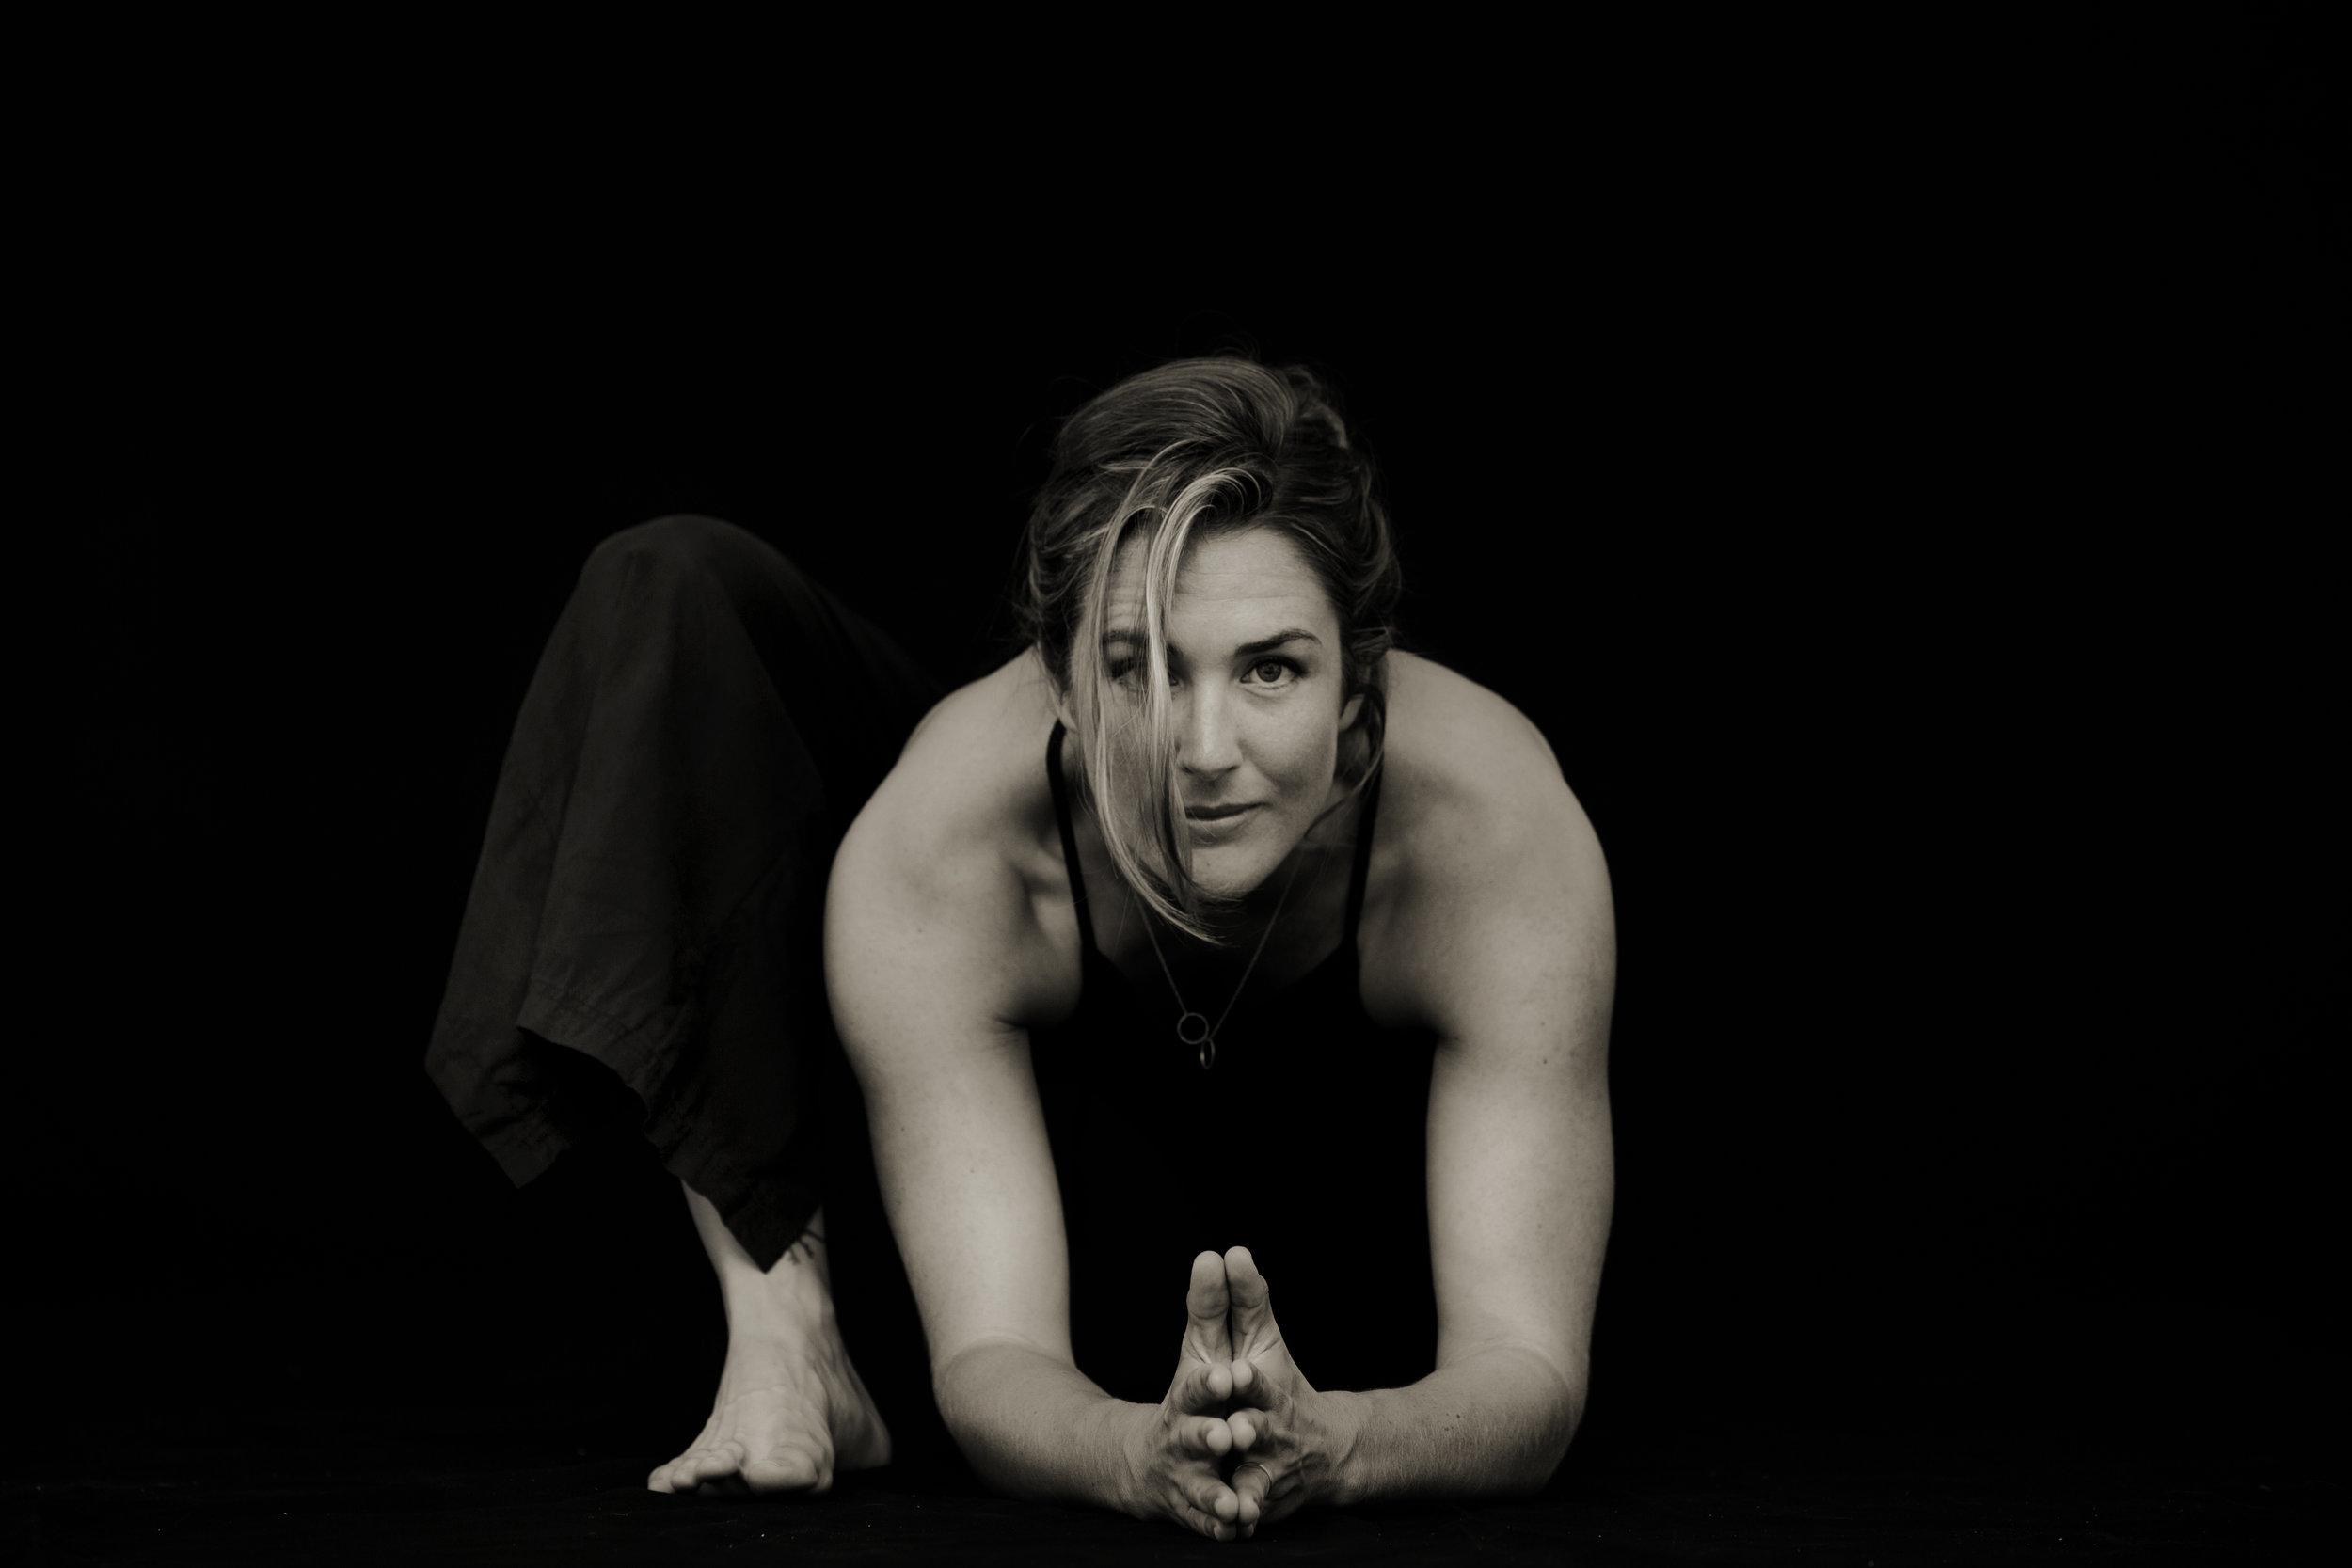 YogaLaura_-4bw.jpg